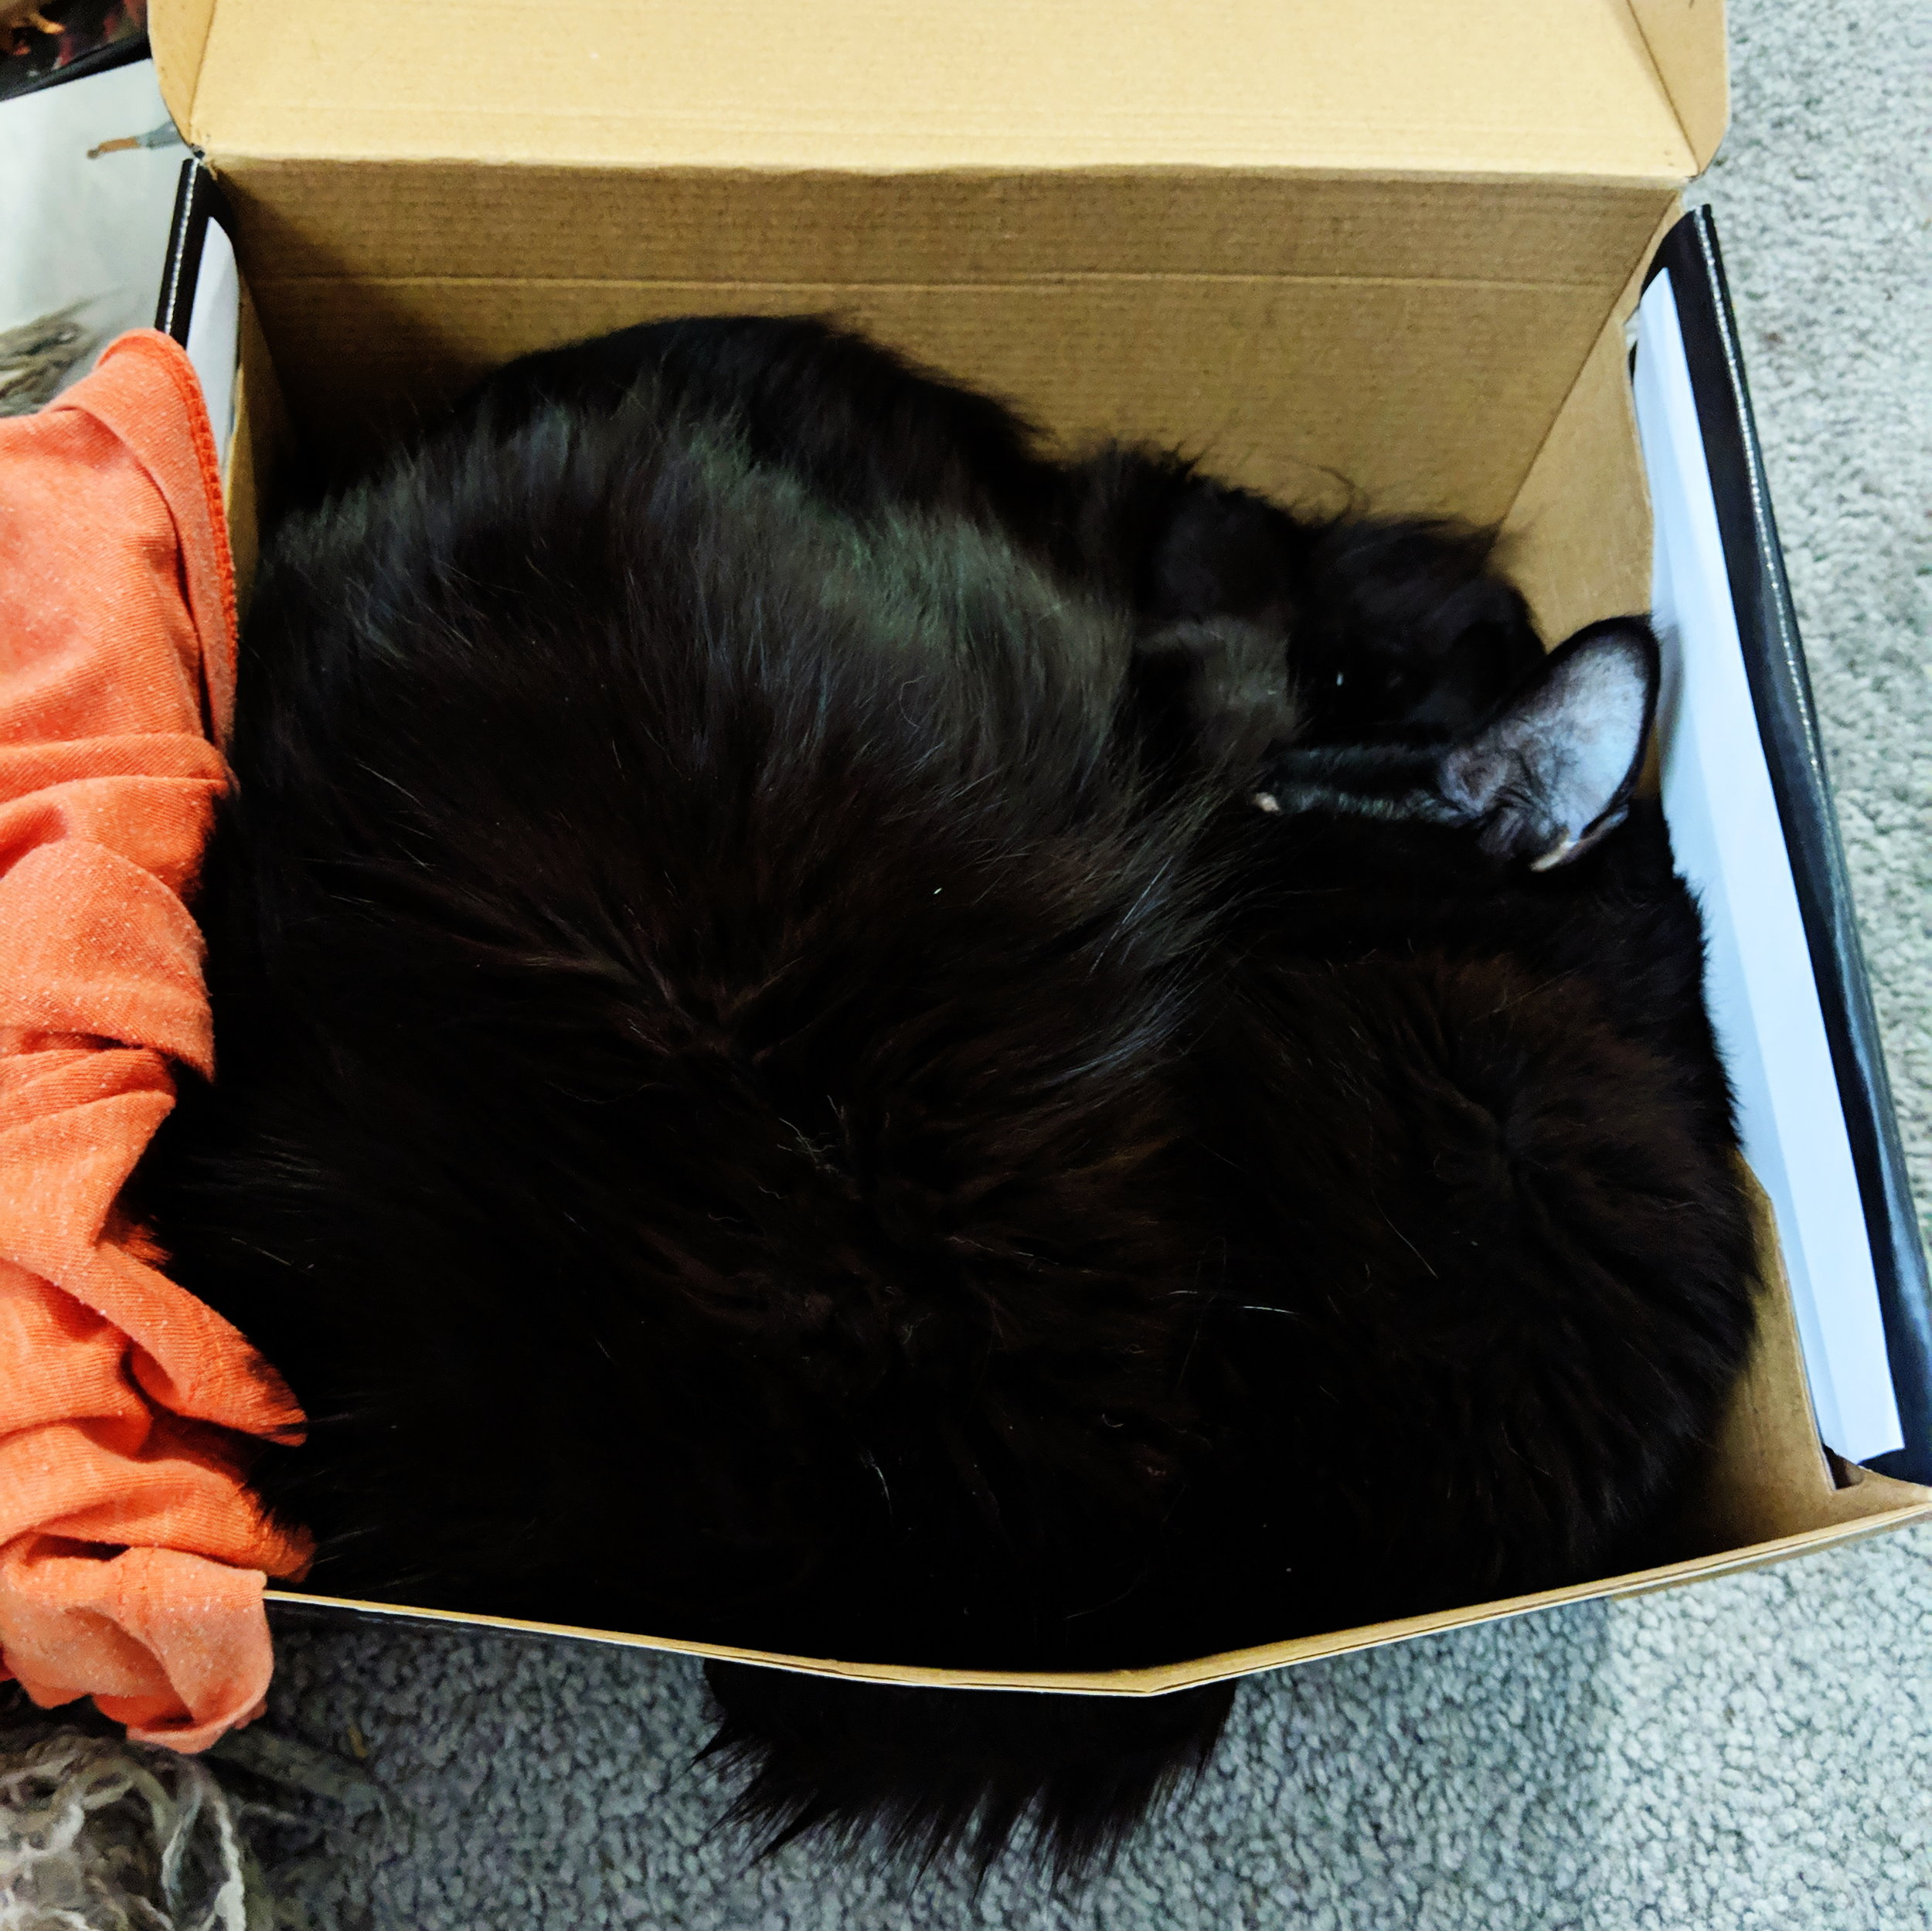 Working from home, my feline supervisor often naps on the job